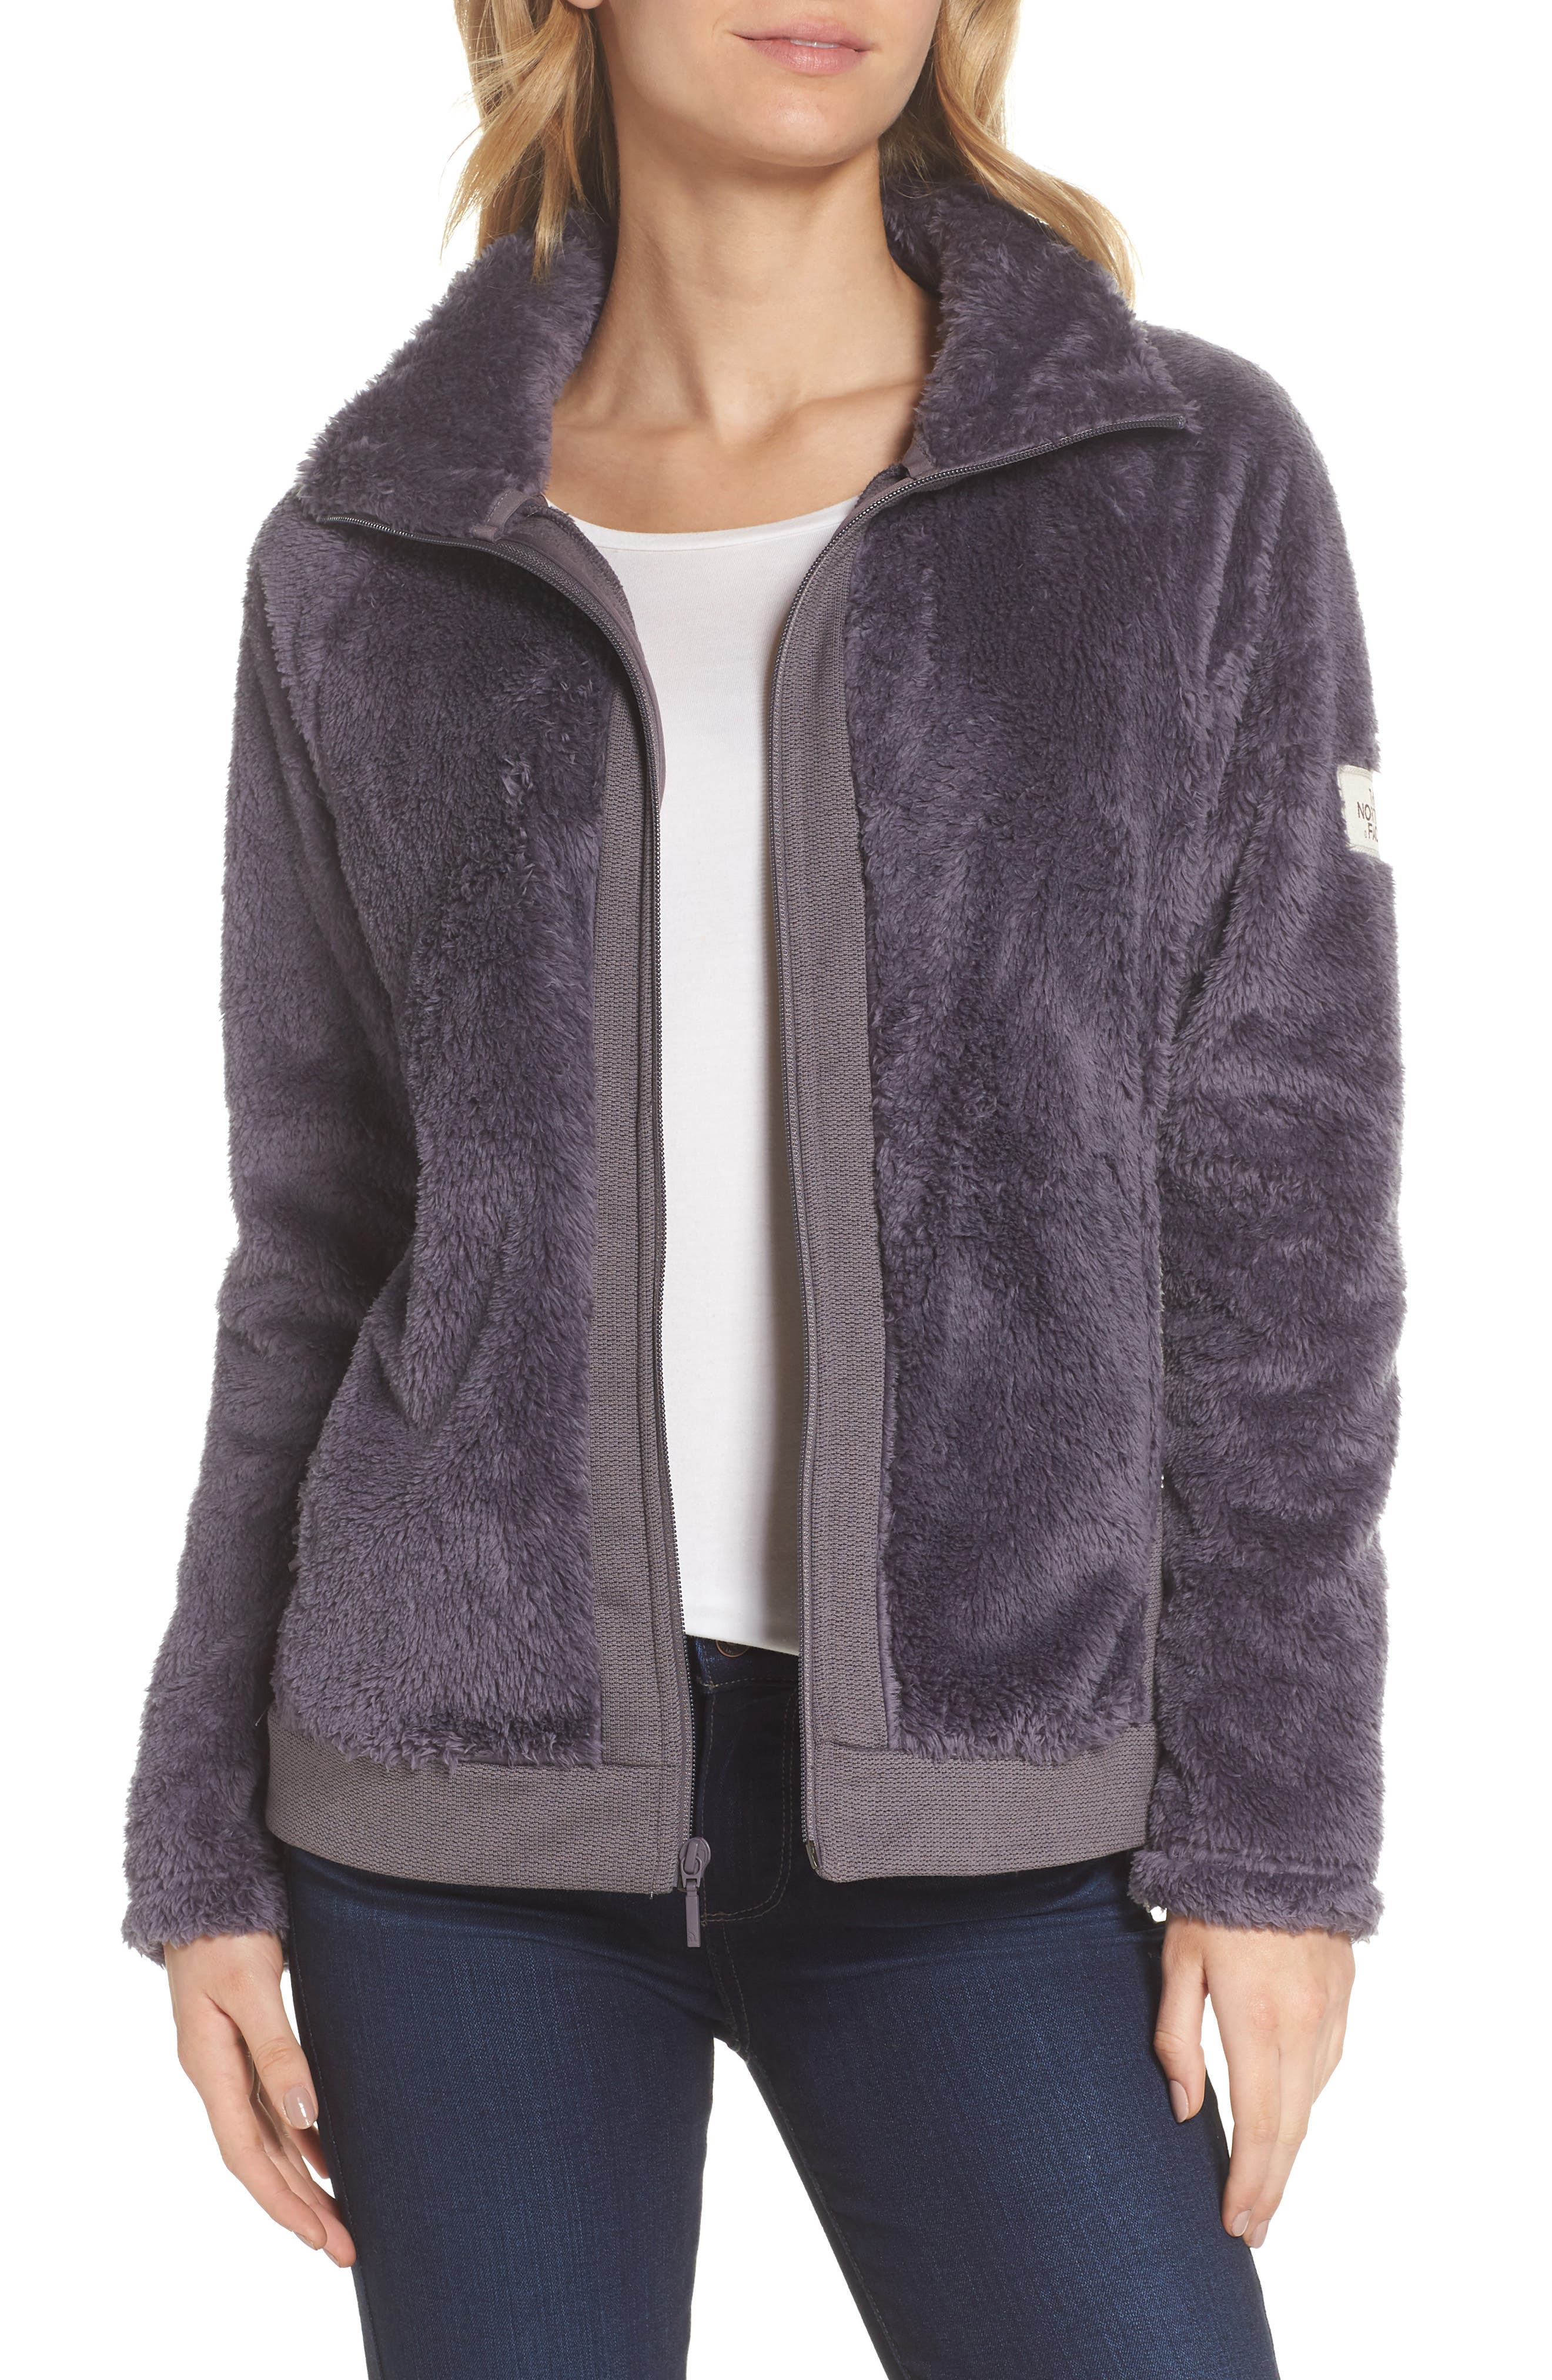 Furry Fleece Jacket,                         Main,                         color, 021